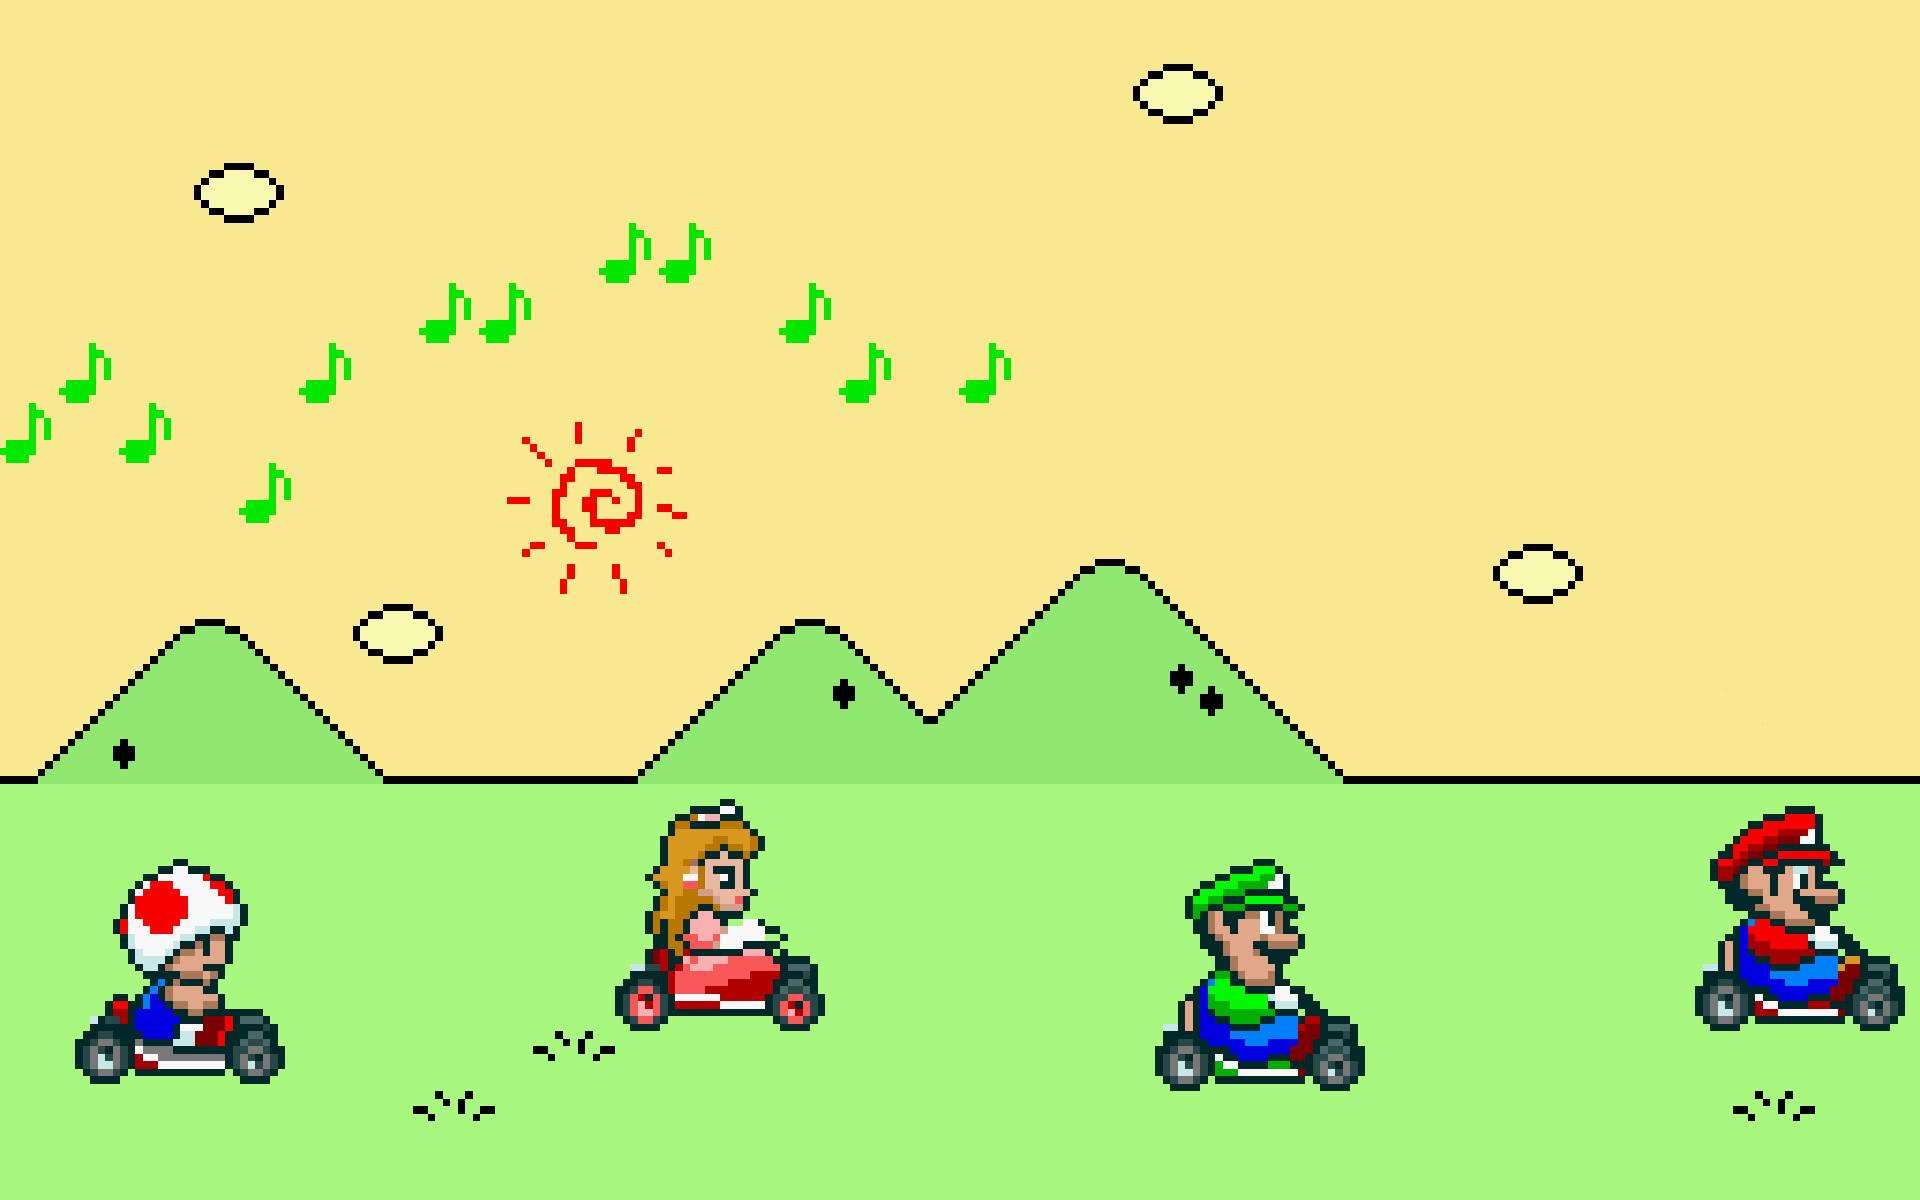 Mario Kart Wallpapers – Wallpaper Cave